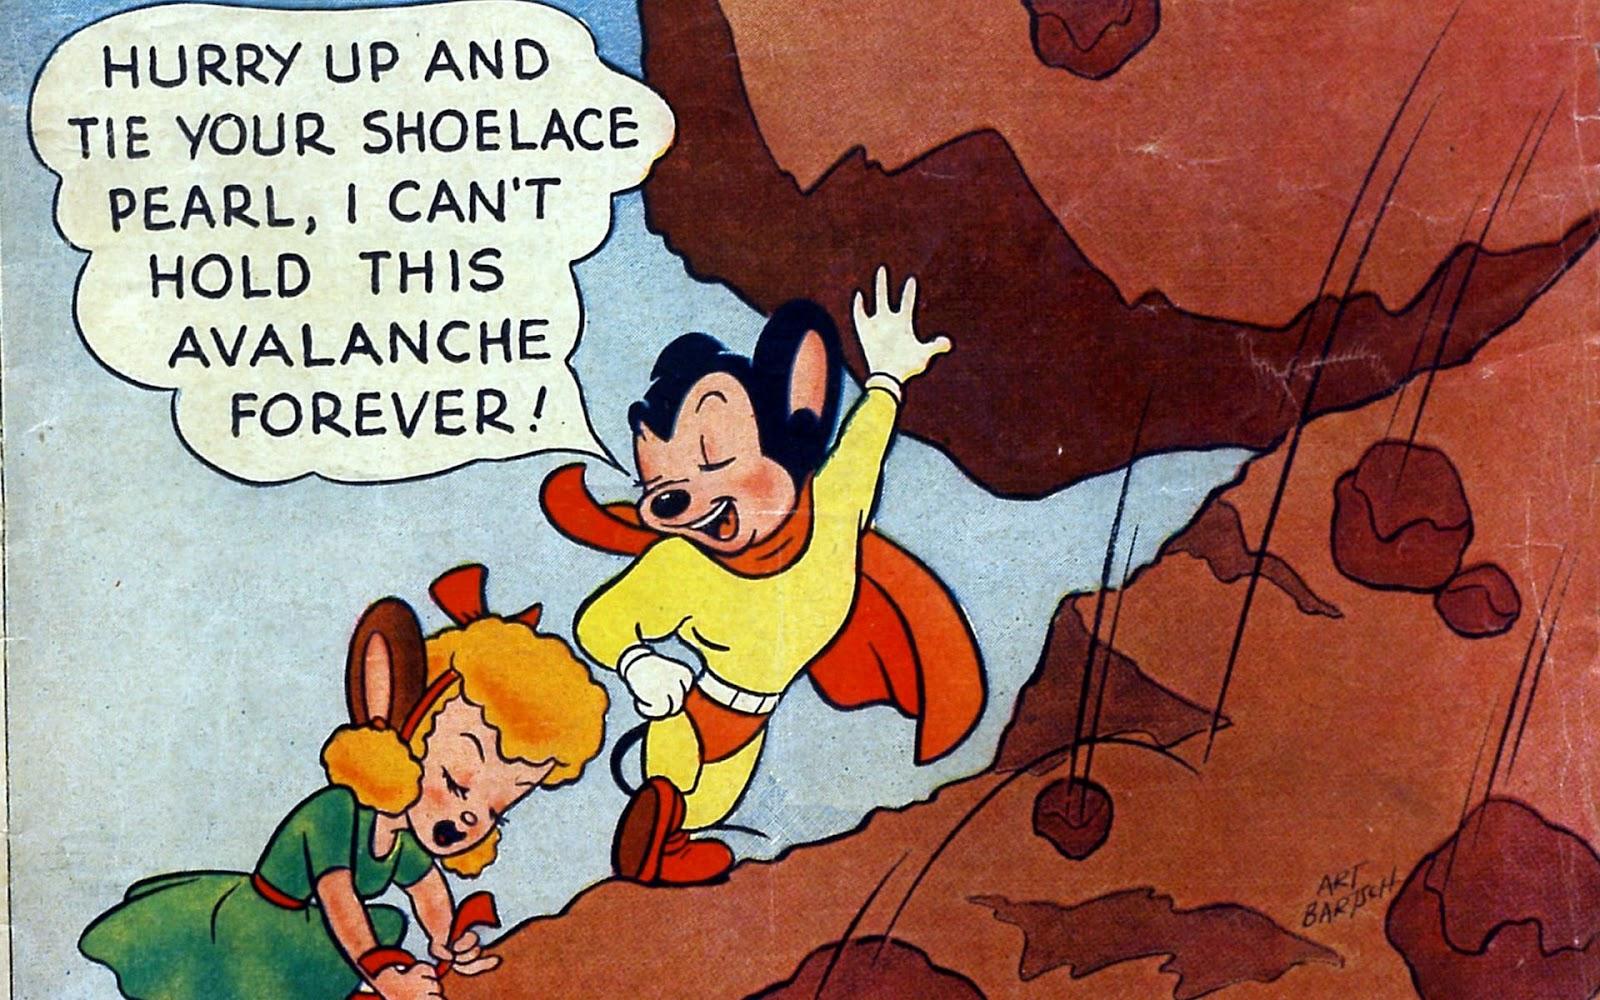 Comic Wallpapers Vintage Hurry Up Pearl Vintage Comic